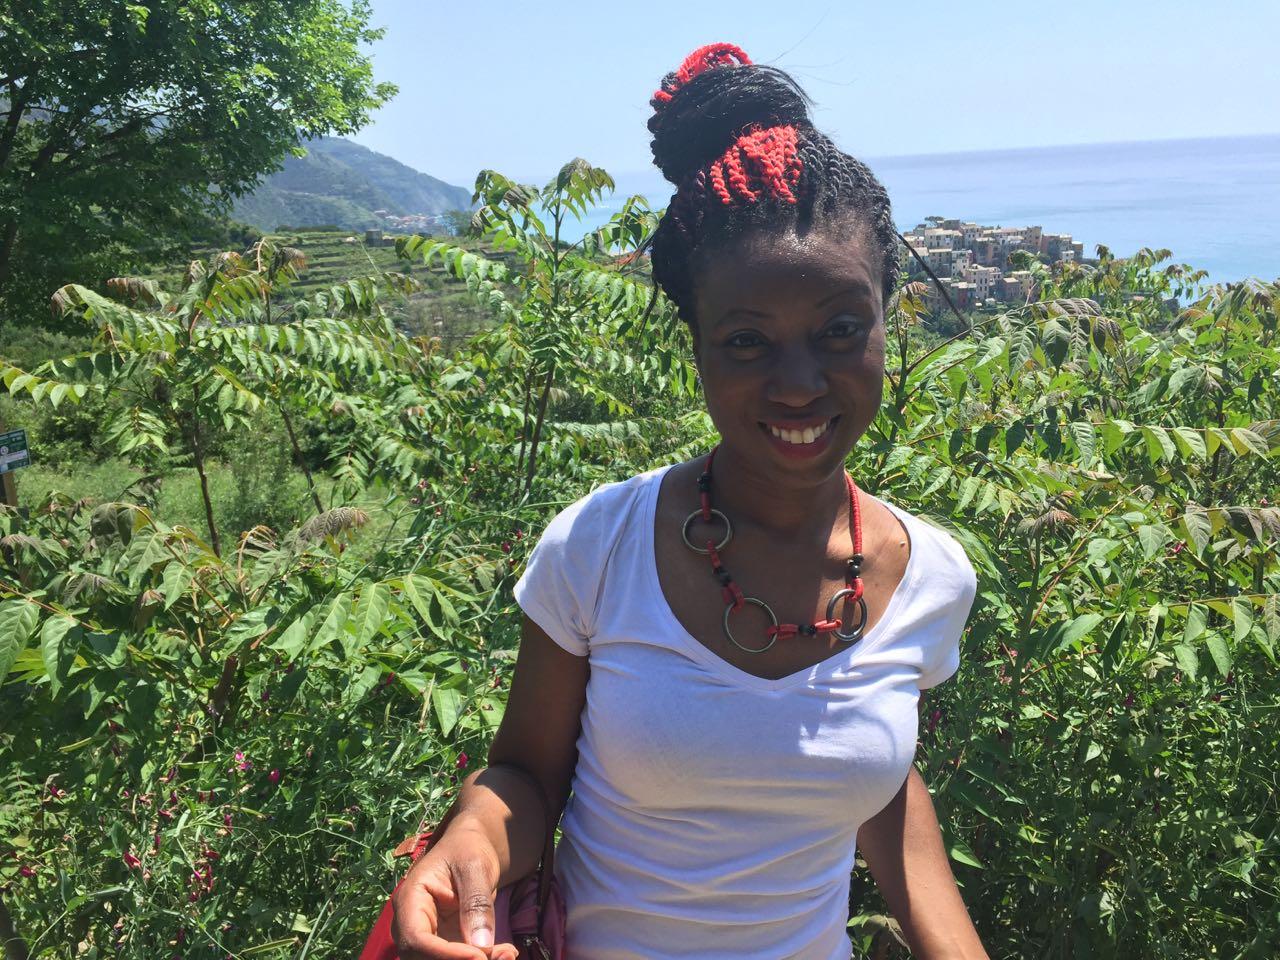 1FTtravel Cinque Terre Hiking Tour Levanto - Liguria, May 17, 2015 - 18 of 37